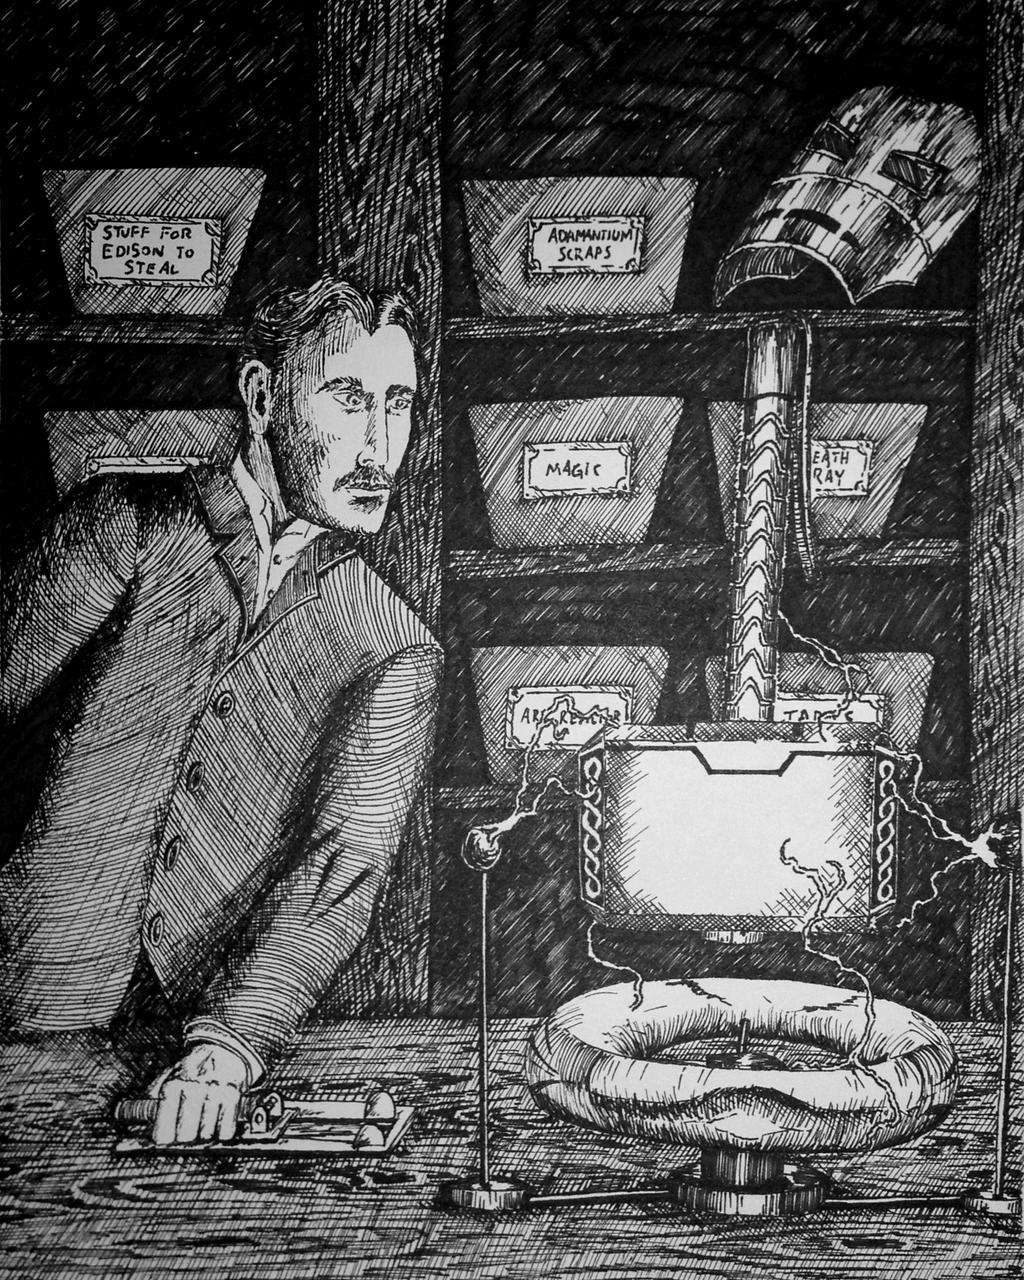 Nikola Tesla Wallpapers 35 Wallpapers: The Marvelous Works Of Nikola Tesla By DestroyingAngel23